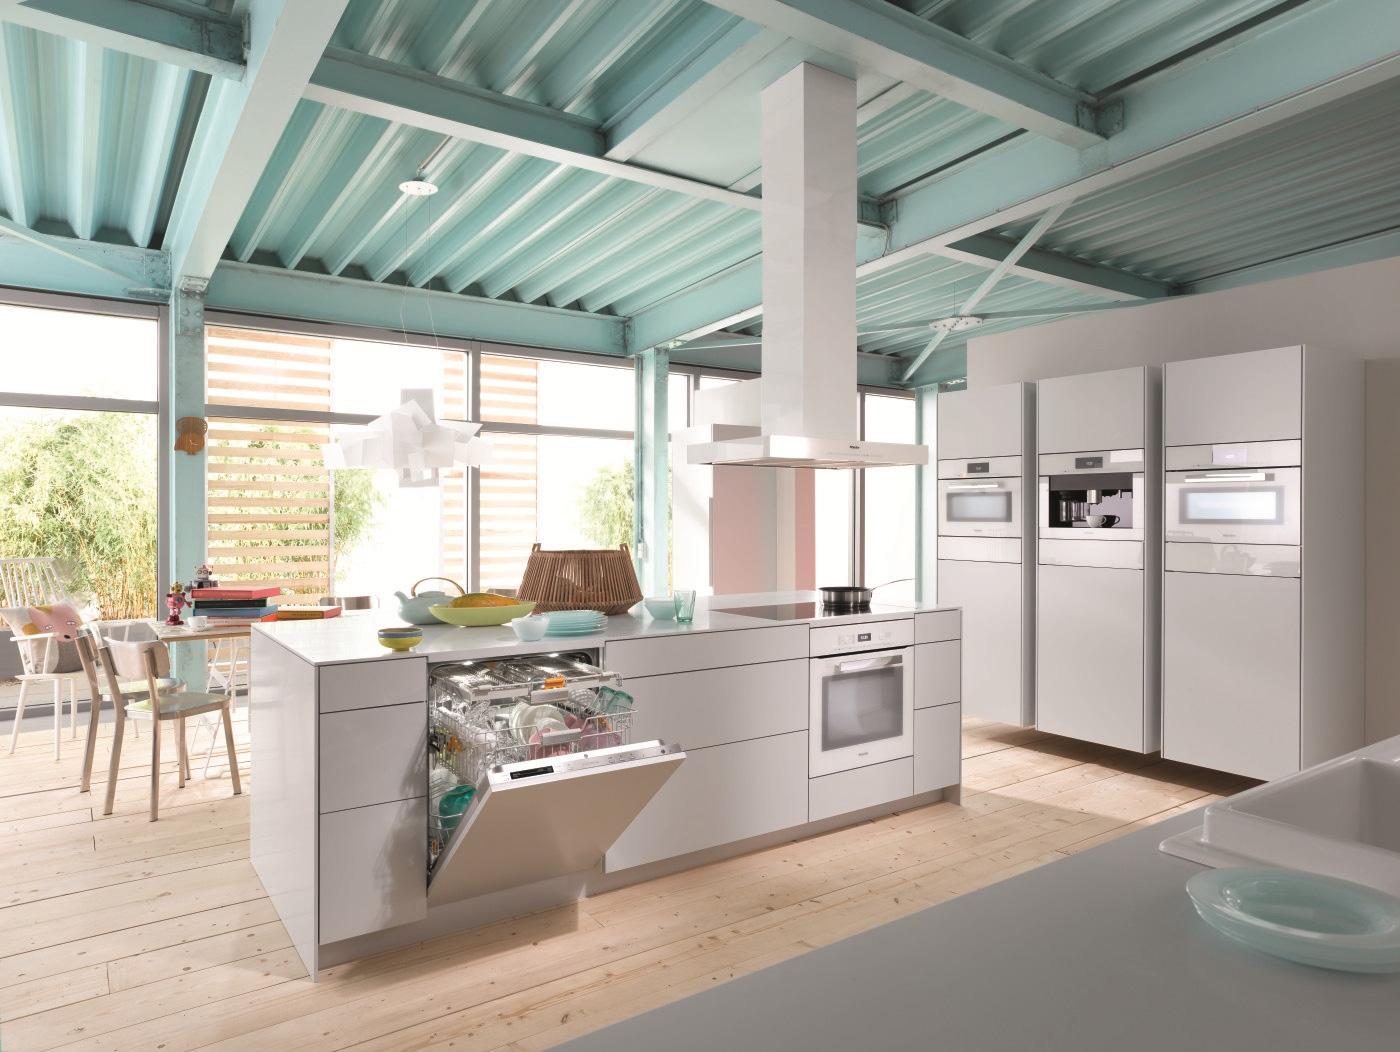 miele k chenger te in salzburg kaufen. Black Bedroom Furniture Sets. Home Design Ideas